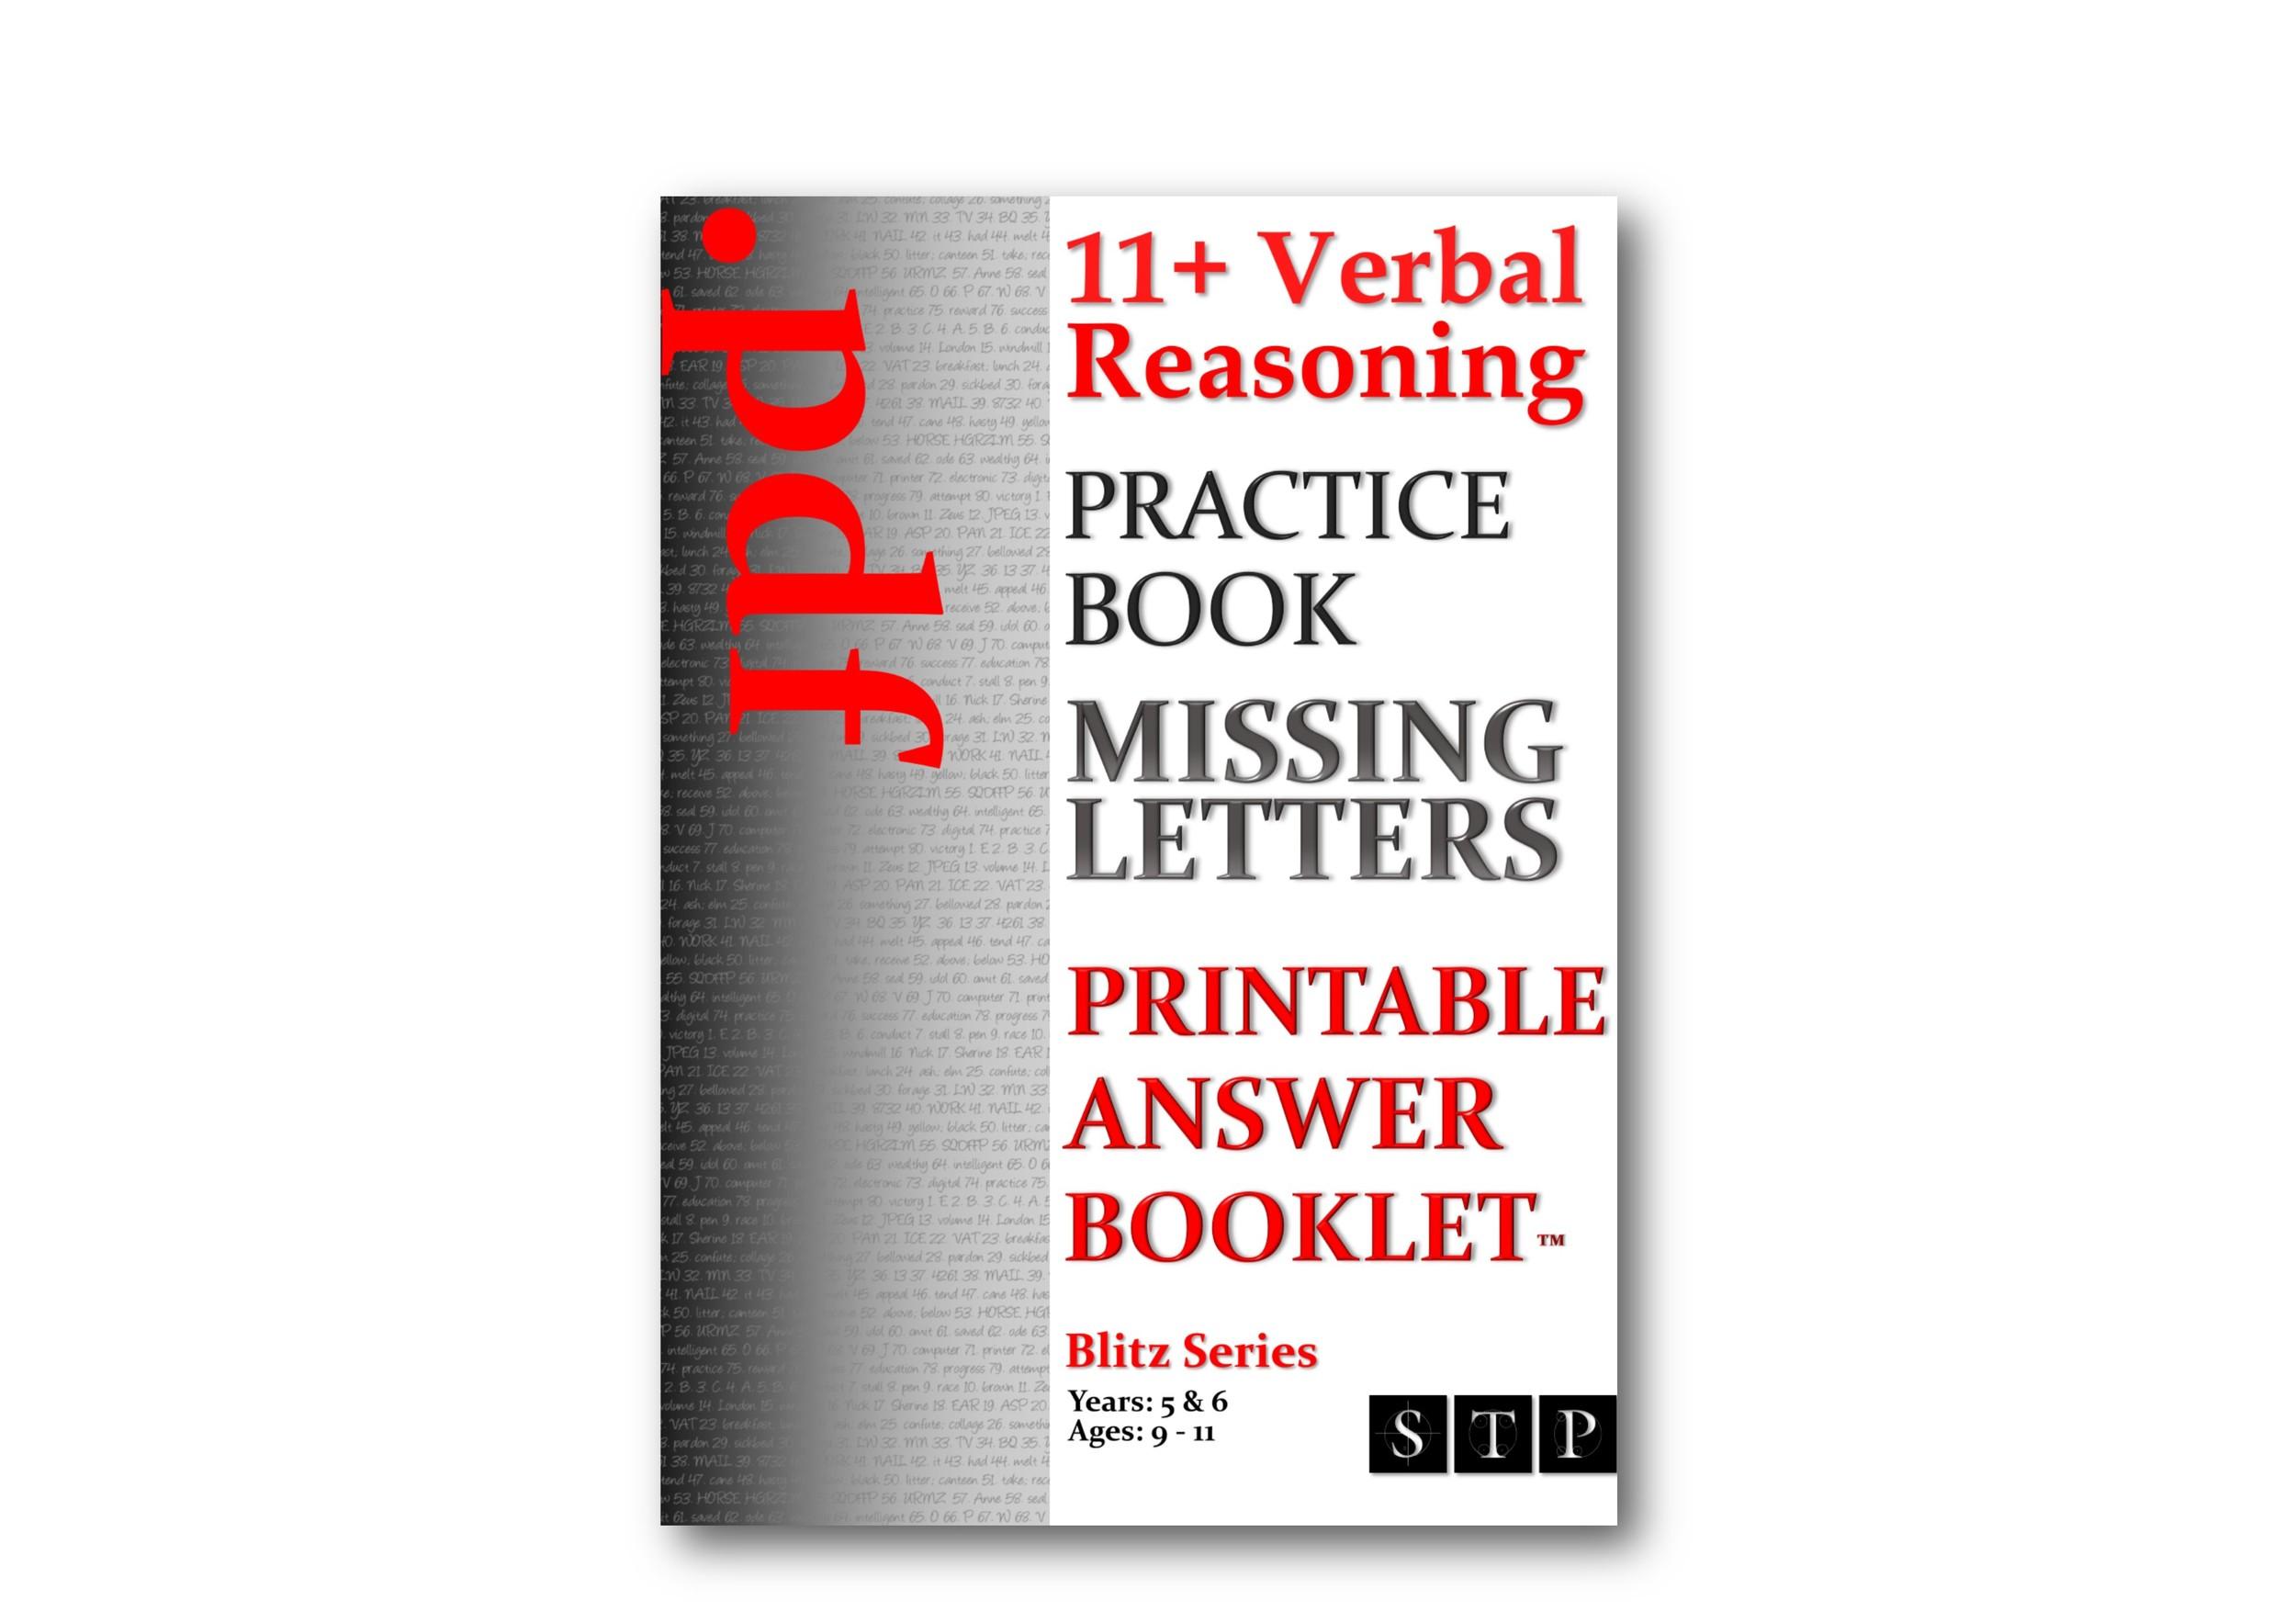 Gallery VRPB - MissLett Im02 (05.17.15) PAB PDF.jpg